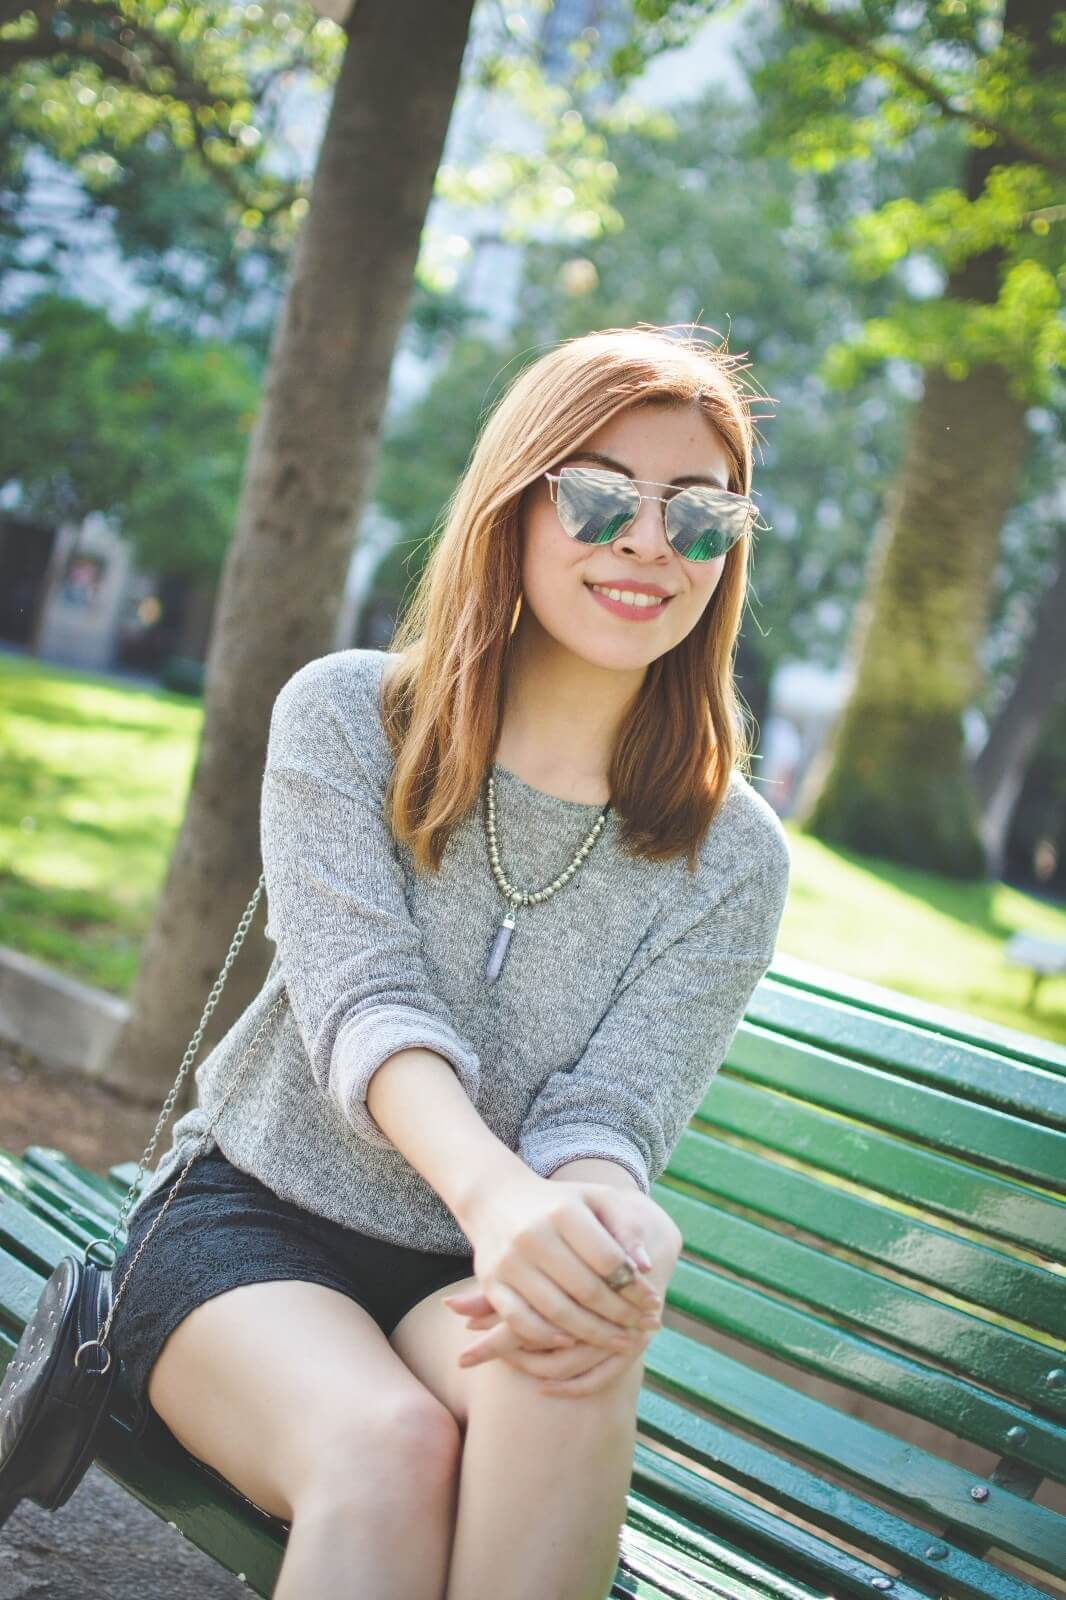 zaful-statement-shoes-silver-mirrored-sunglasses-deborah-ferrero-streetstyle-style-by-deb04